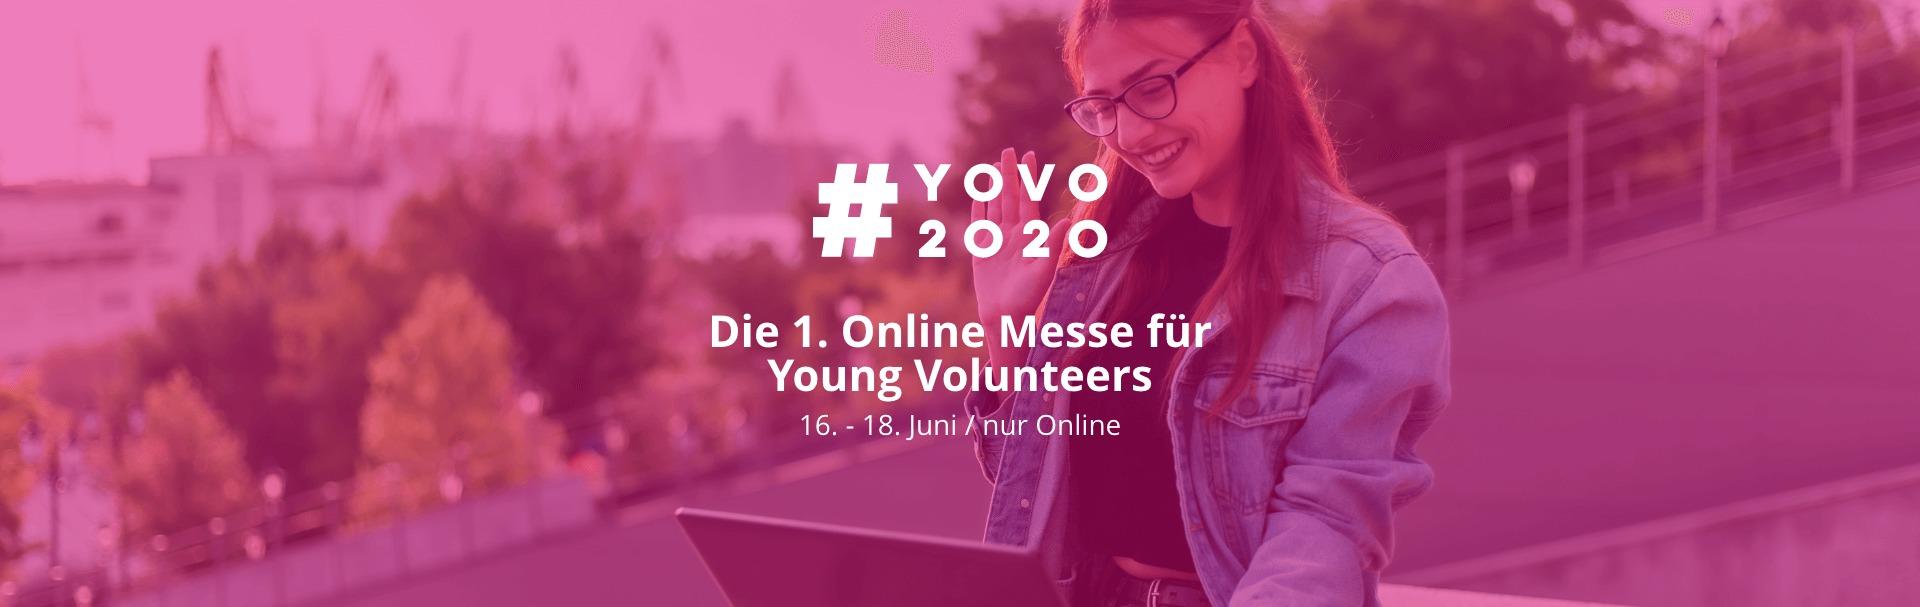 yovo2020-header